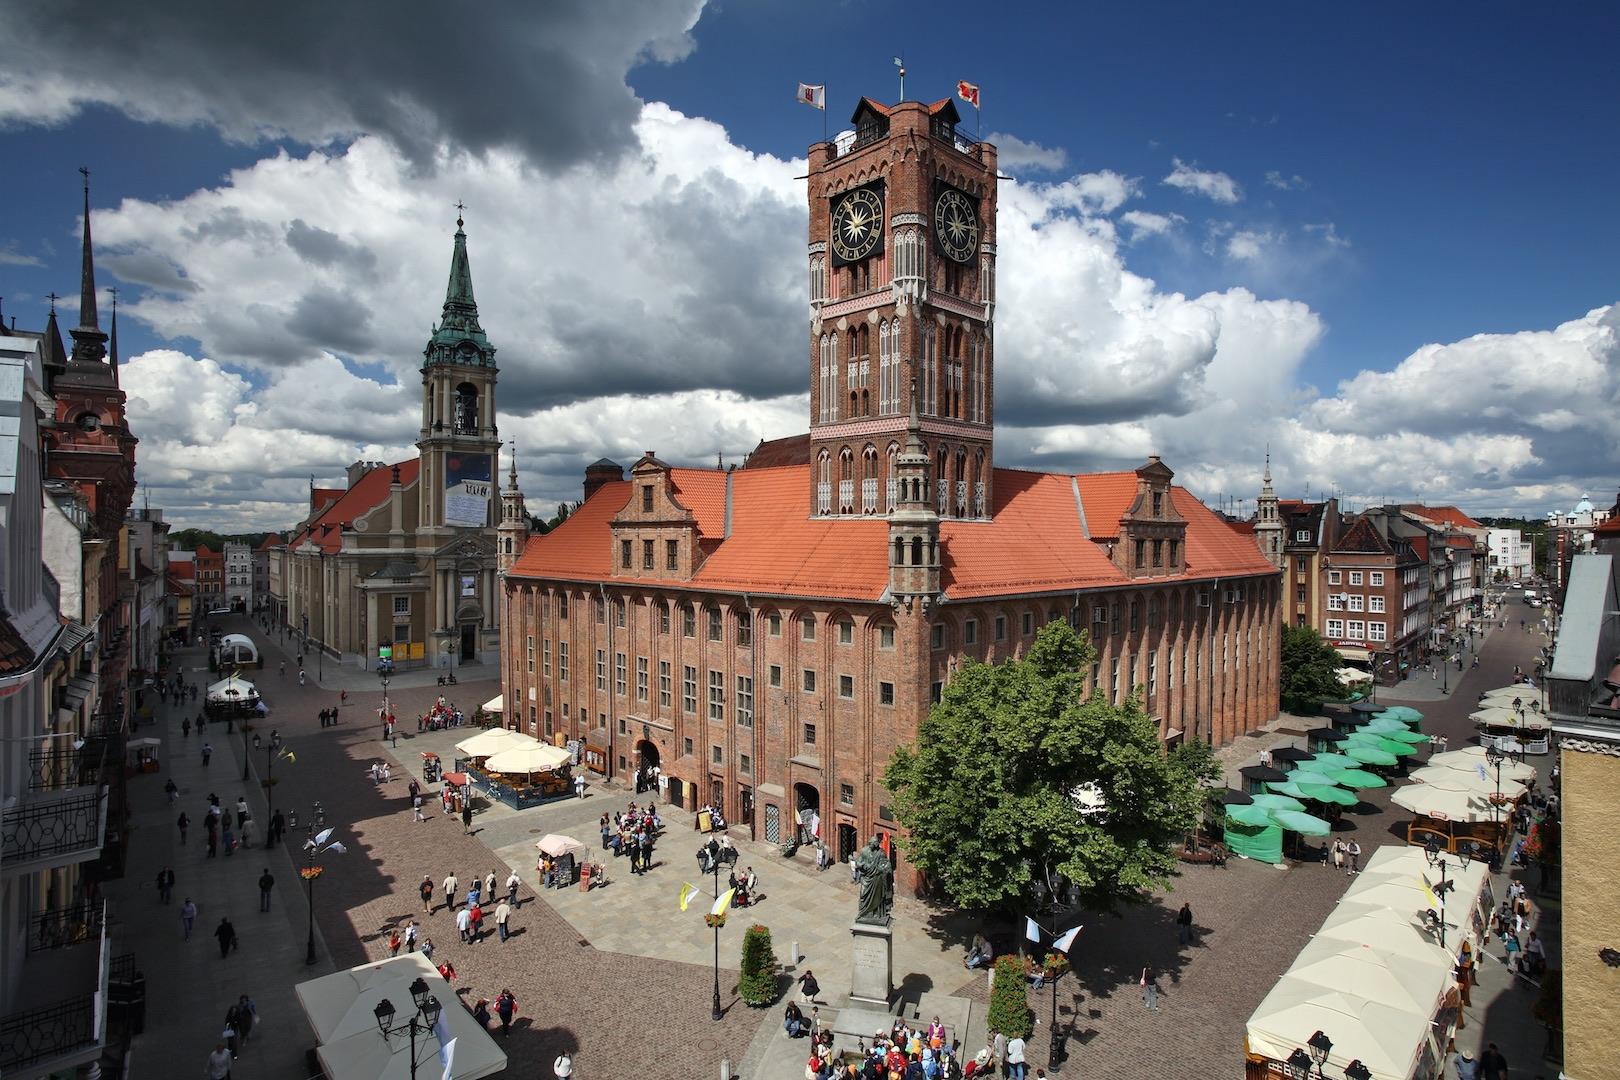 Poznan Torun Tour - day trip to polish City of Angles